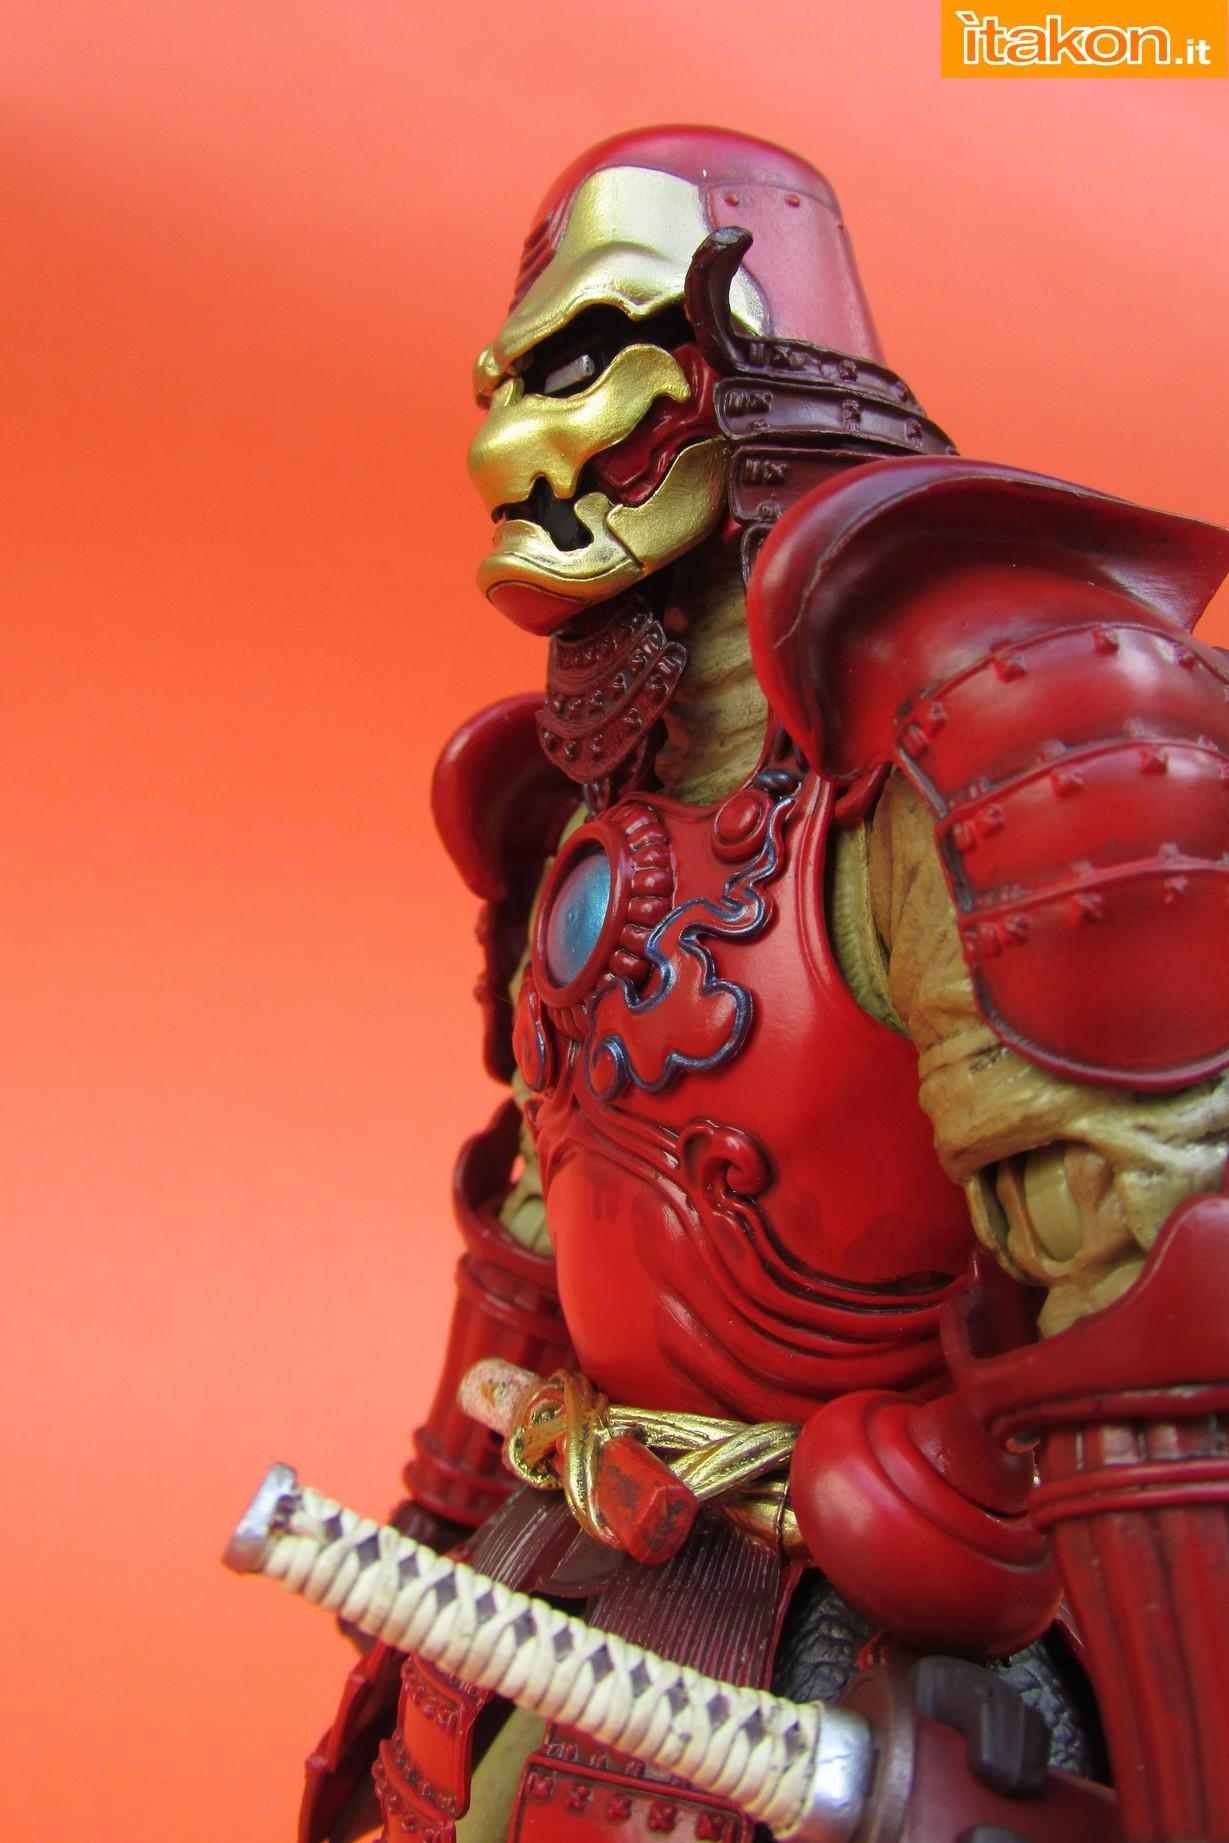 Link a Marvel Comics Koutetsu Samurai Iron Man Mark 3 Meishou MANGA REALIZATION review Bandai Itakon.it29